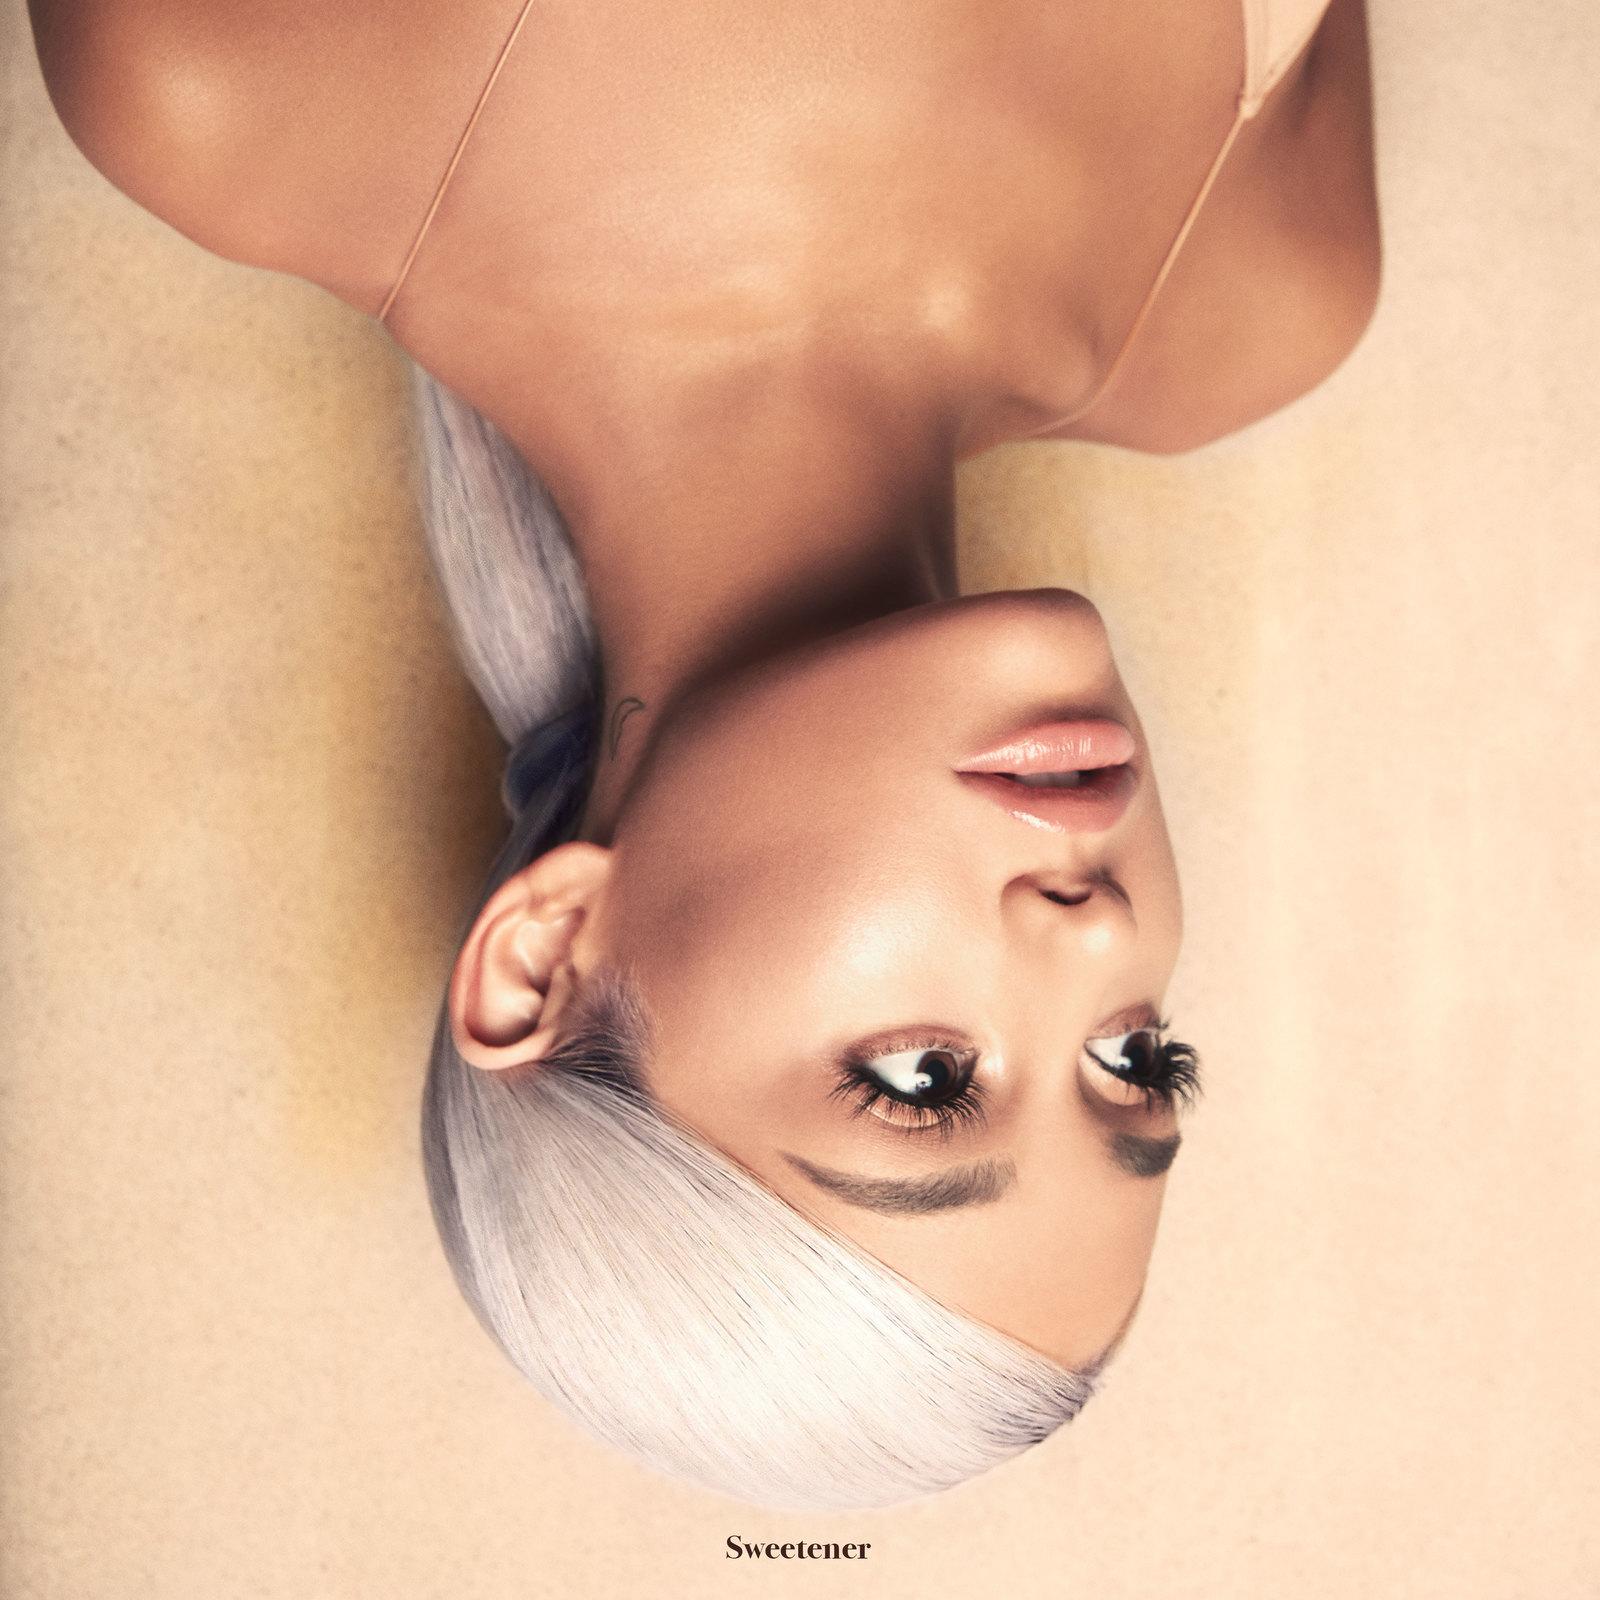 Sweetener by Ariana Grande image